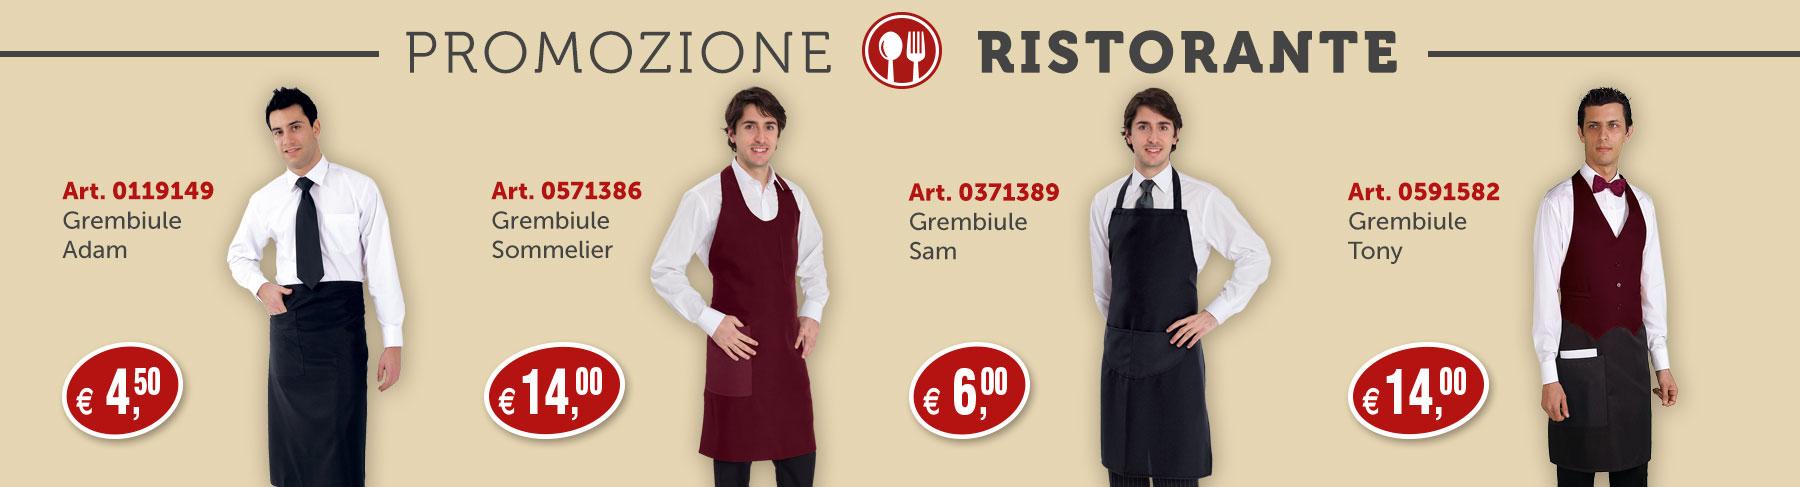 slide_promo_ristorante